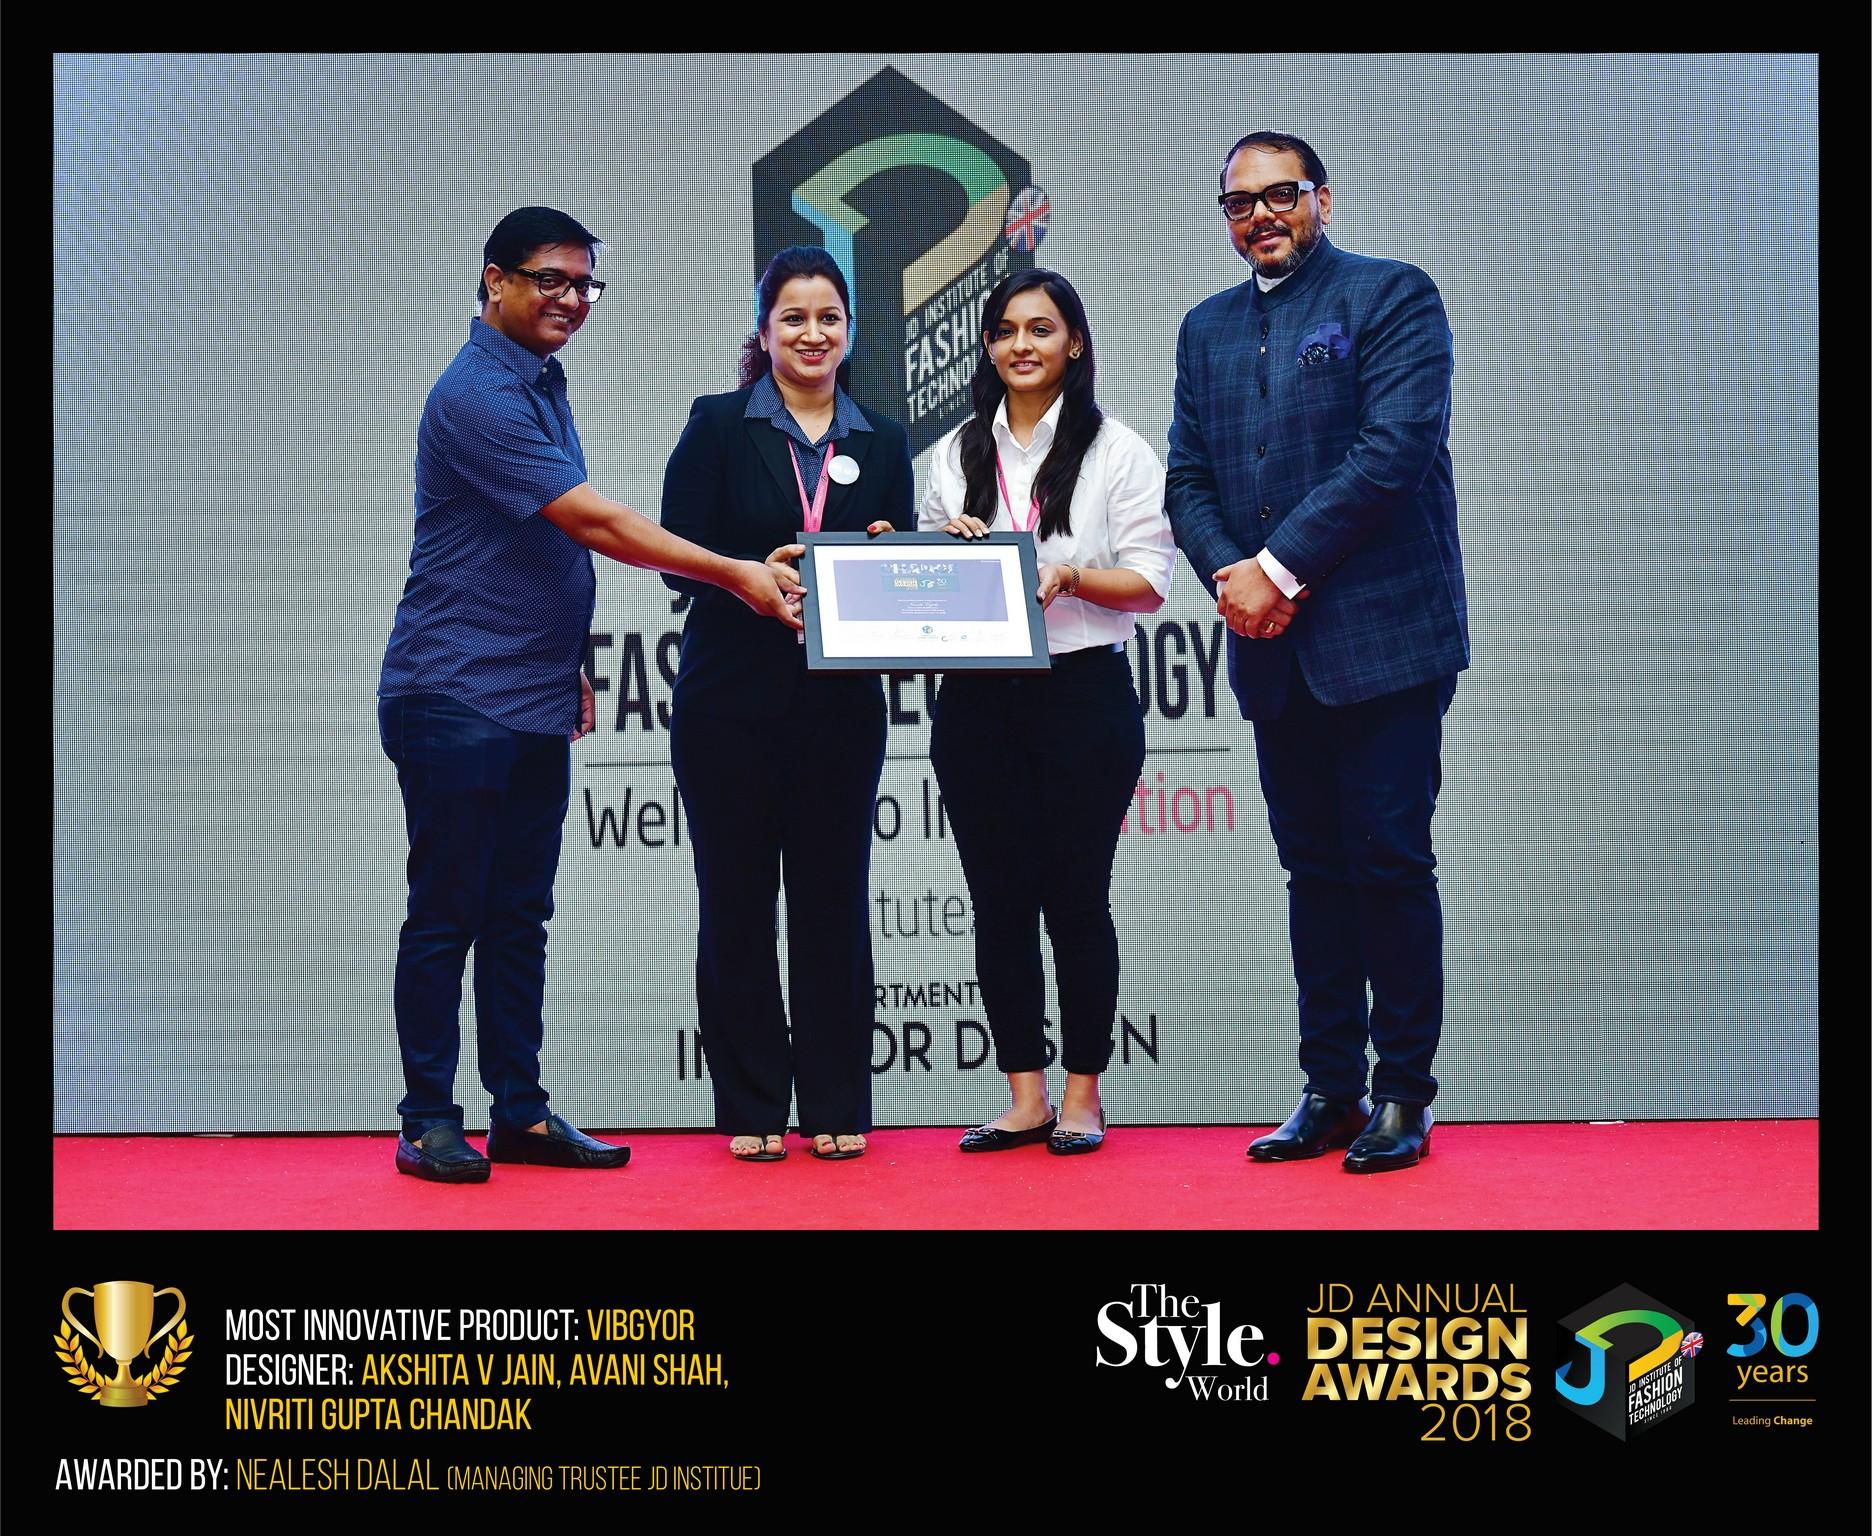 VIBGYOR – Change – JD Annual Design Awards 2018 | Designer: Akshitha V Jain, Avani Shah, Nivrithi Gupta | Photography : Jerin Nath (@jerin_nath) vibgyor - VIBGYOR1 - VIBGYOR – Change – JD Annual Design Awards 2018